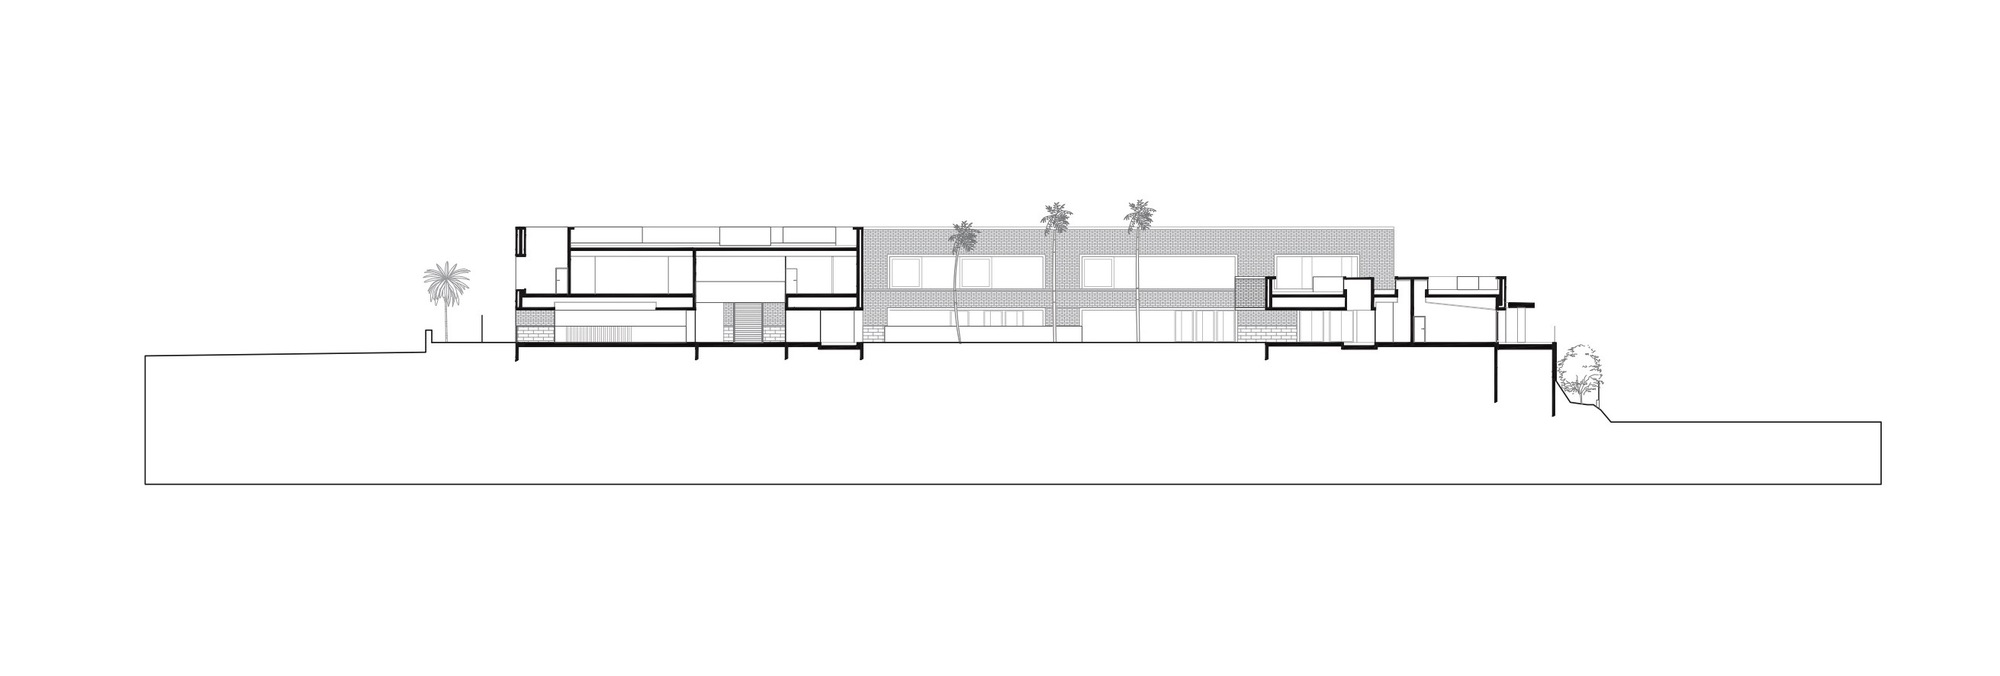 galeria de escola municipal jacqueline de romilly st phane fernandez sarl atelier fernandez. Black Bedroom Furniture Sets. Home Design Ideas